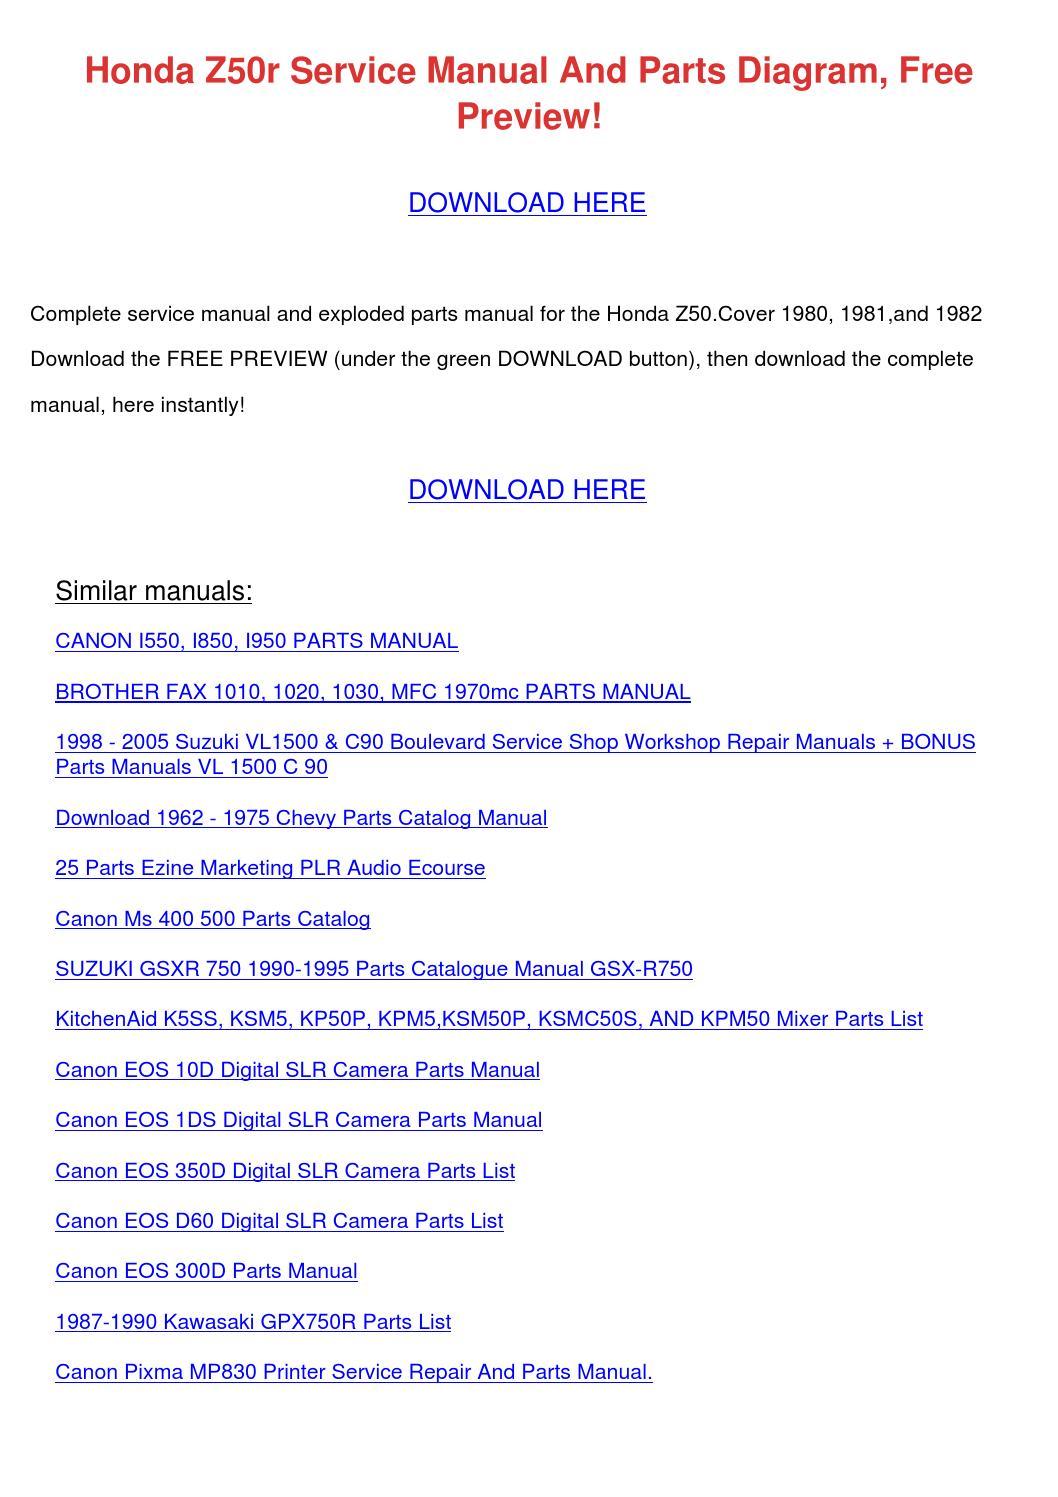 Honda Z50r Service Manual And Parts Diagram F By Melvinmcvey